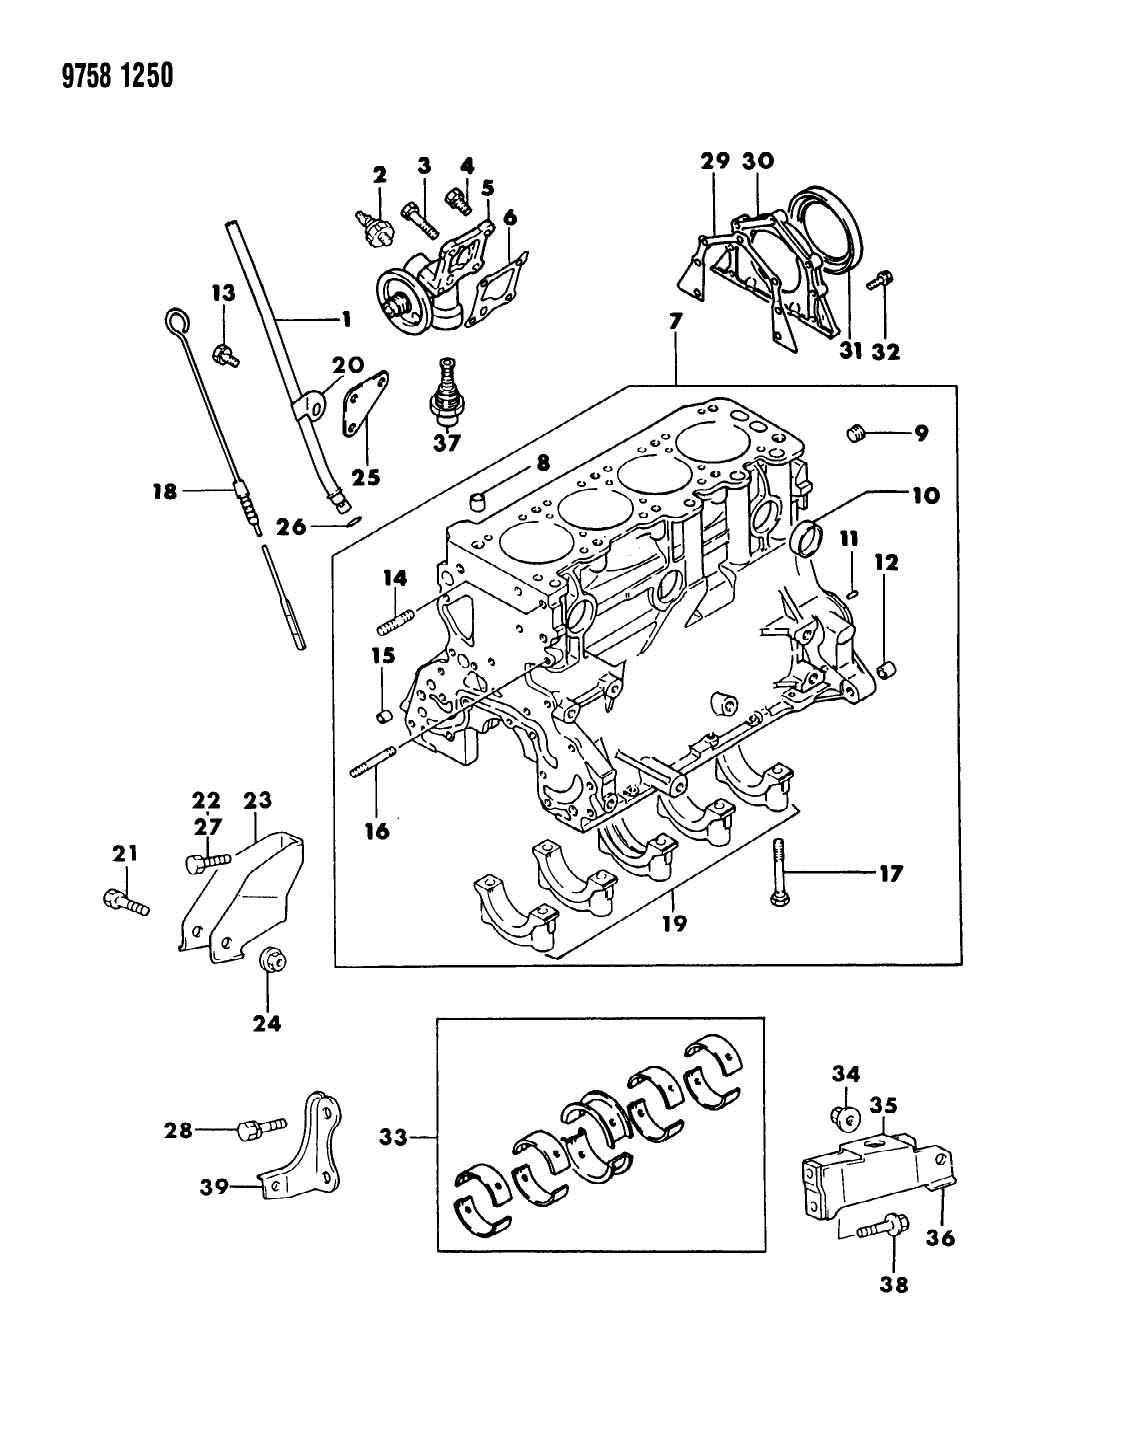 Chrysler Sebring Jx Convertible 2 5l V6 A T Bolt Hex